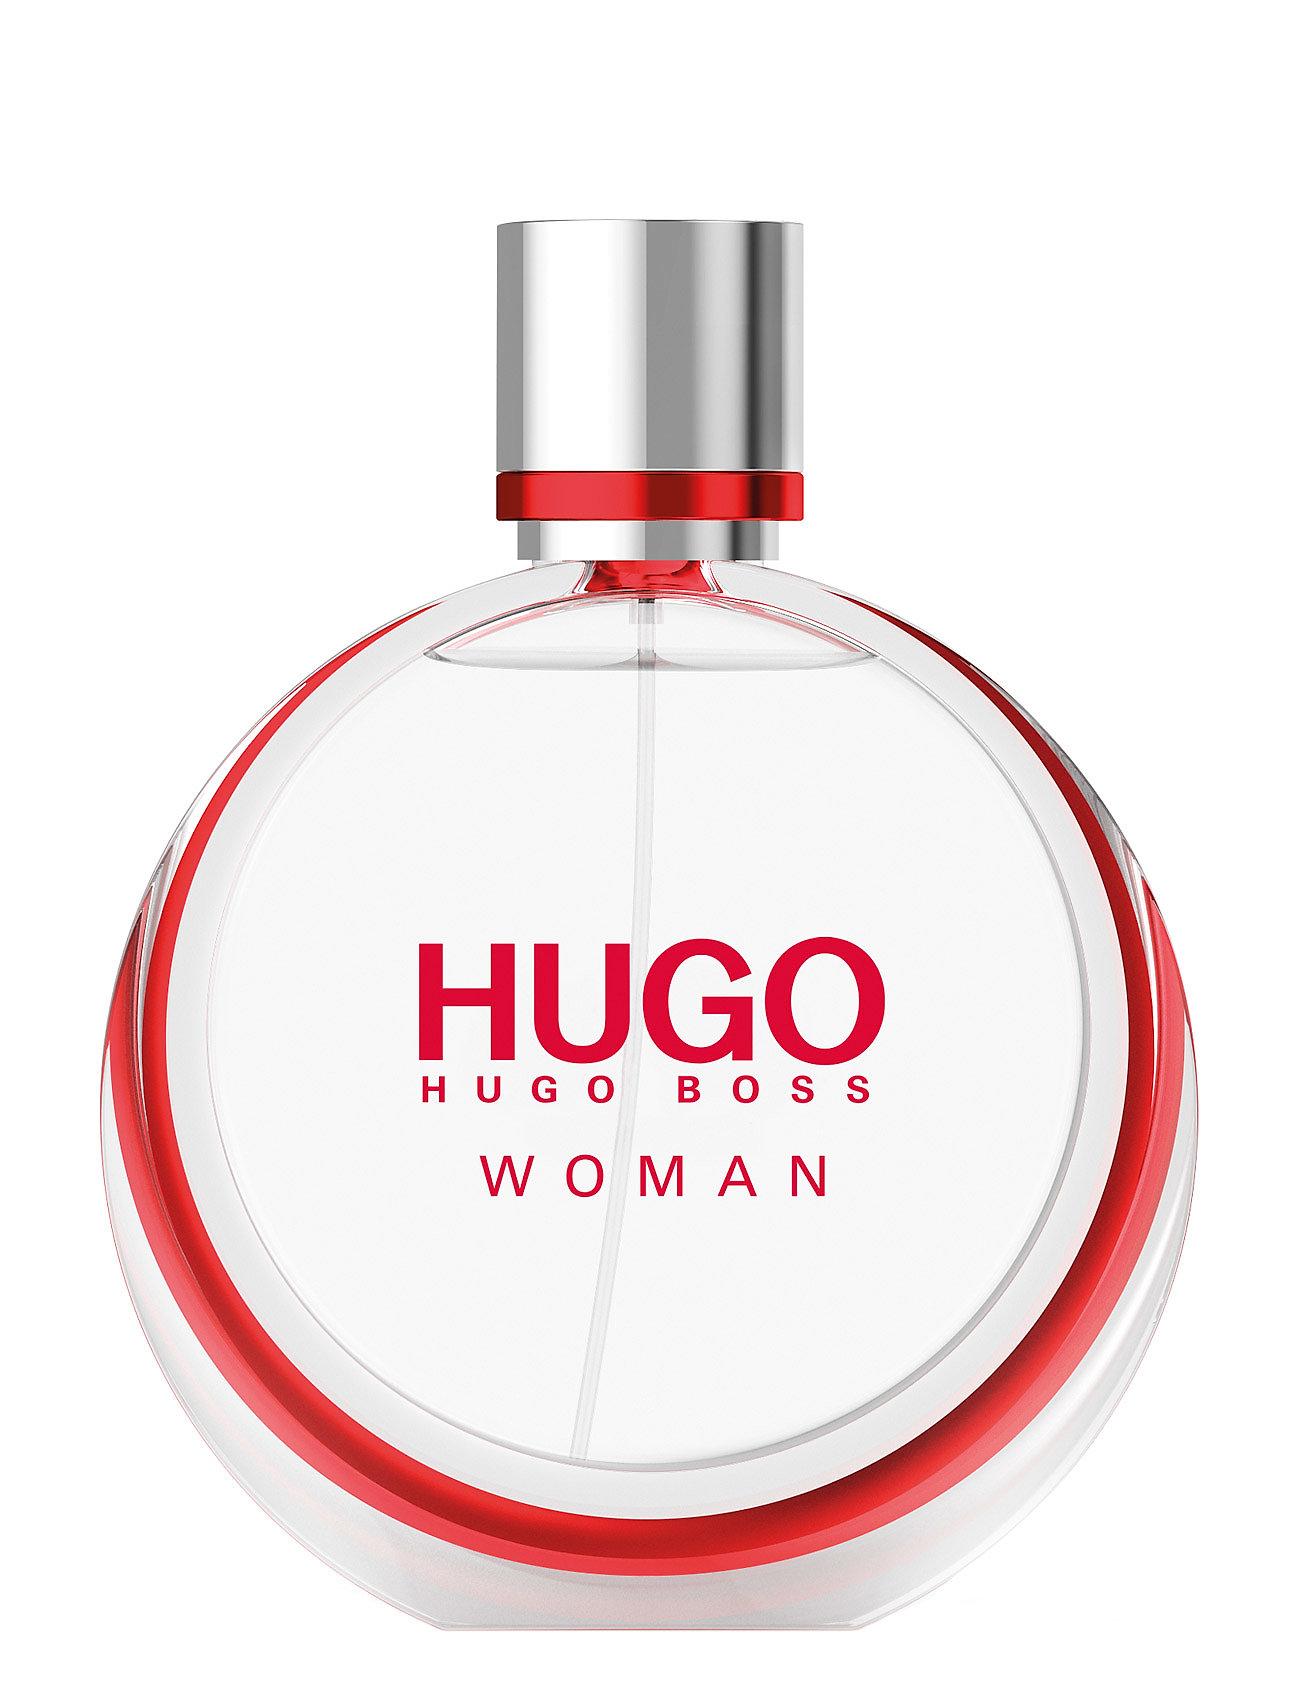 Hugo boss hugo woman eau de parfum fra hugo boss fragrance på boozt.com dk